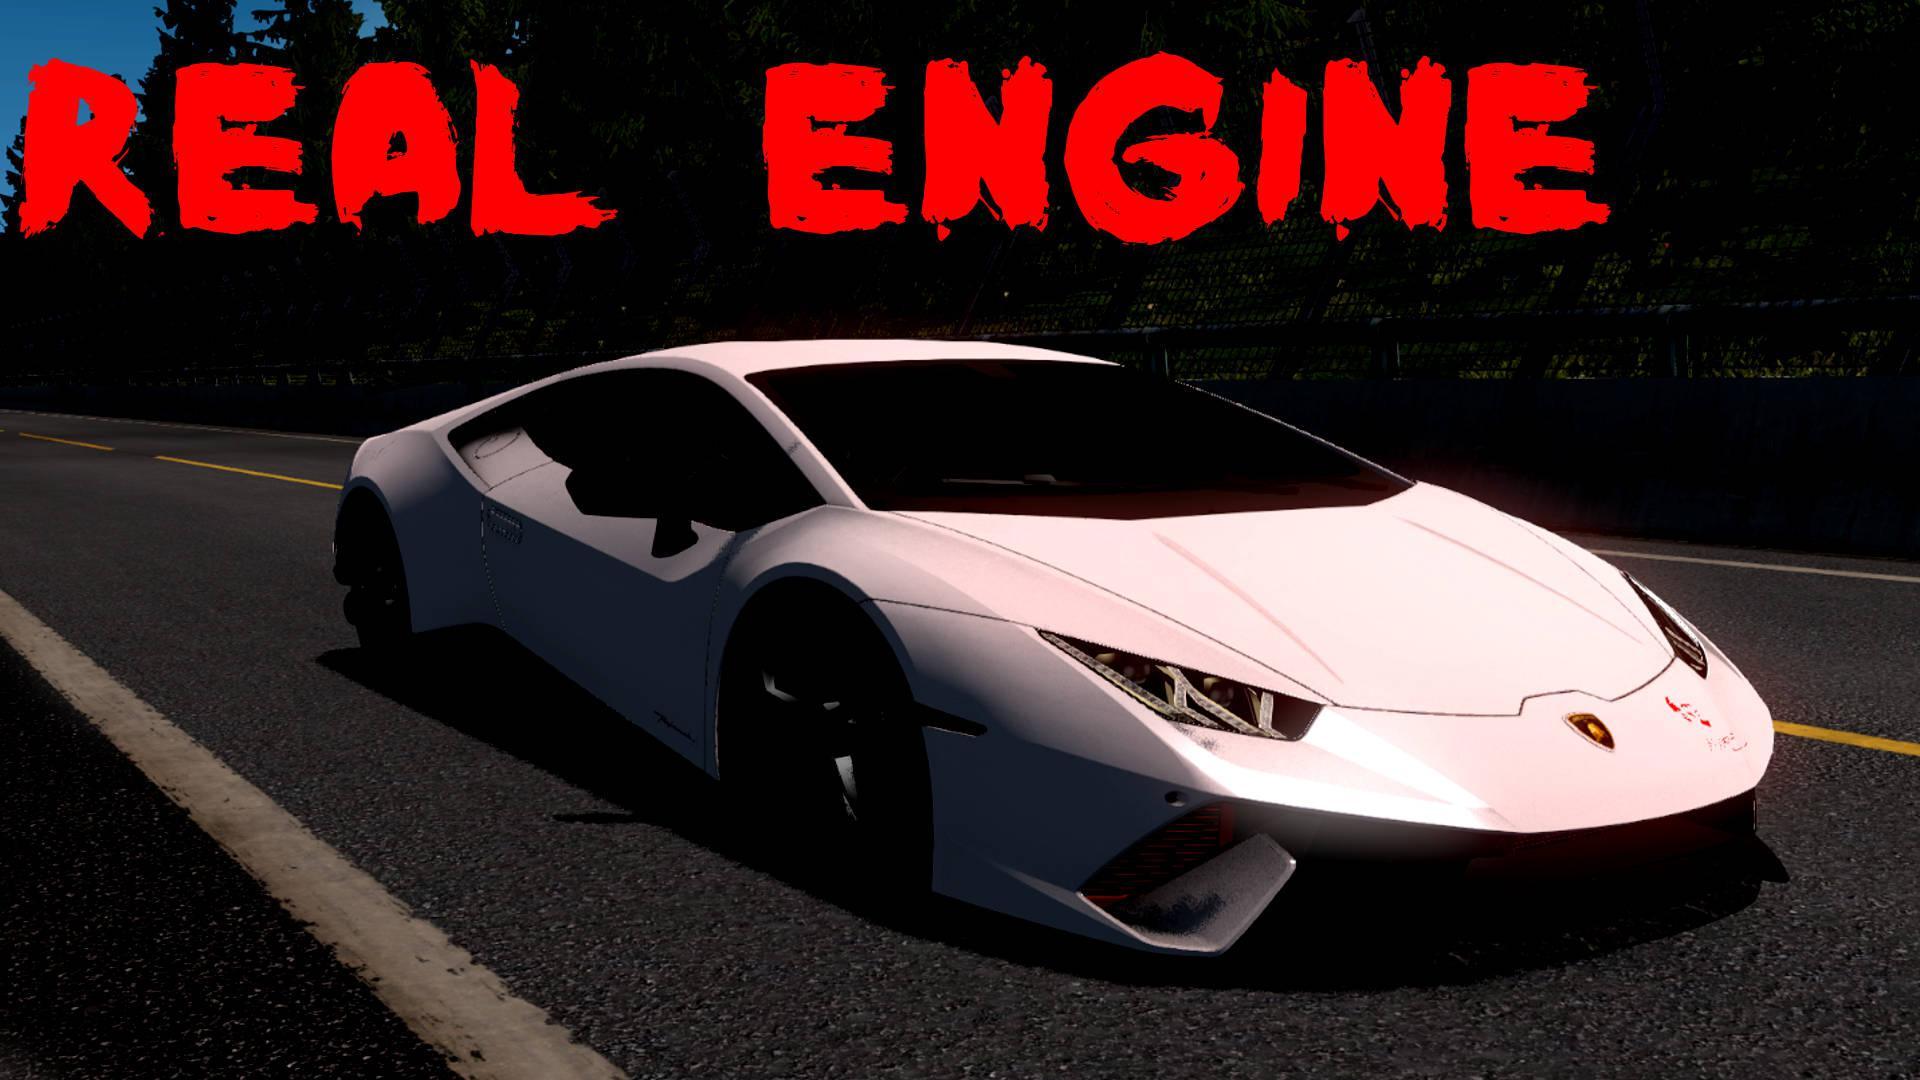 ETS2 - Lamborghini Huracan [Real Engine] 1.36.x